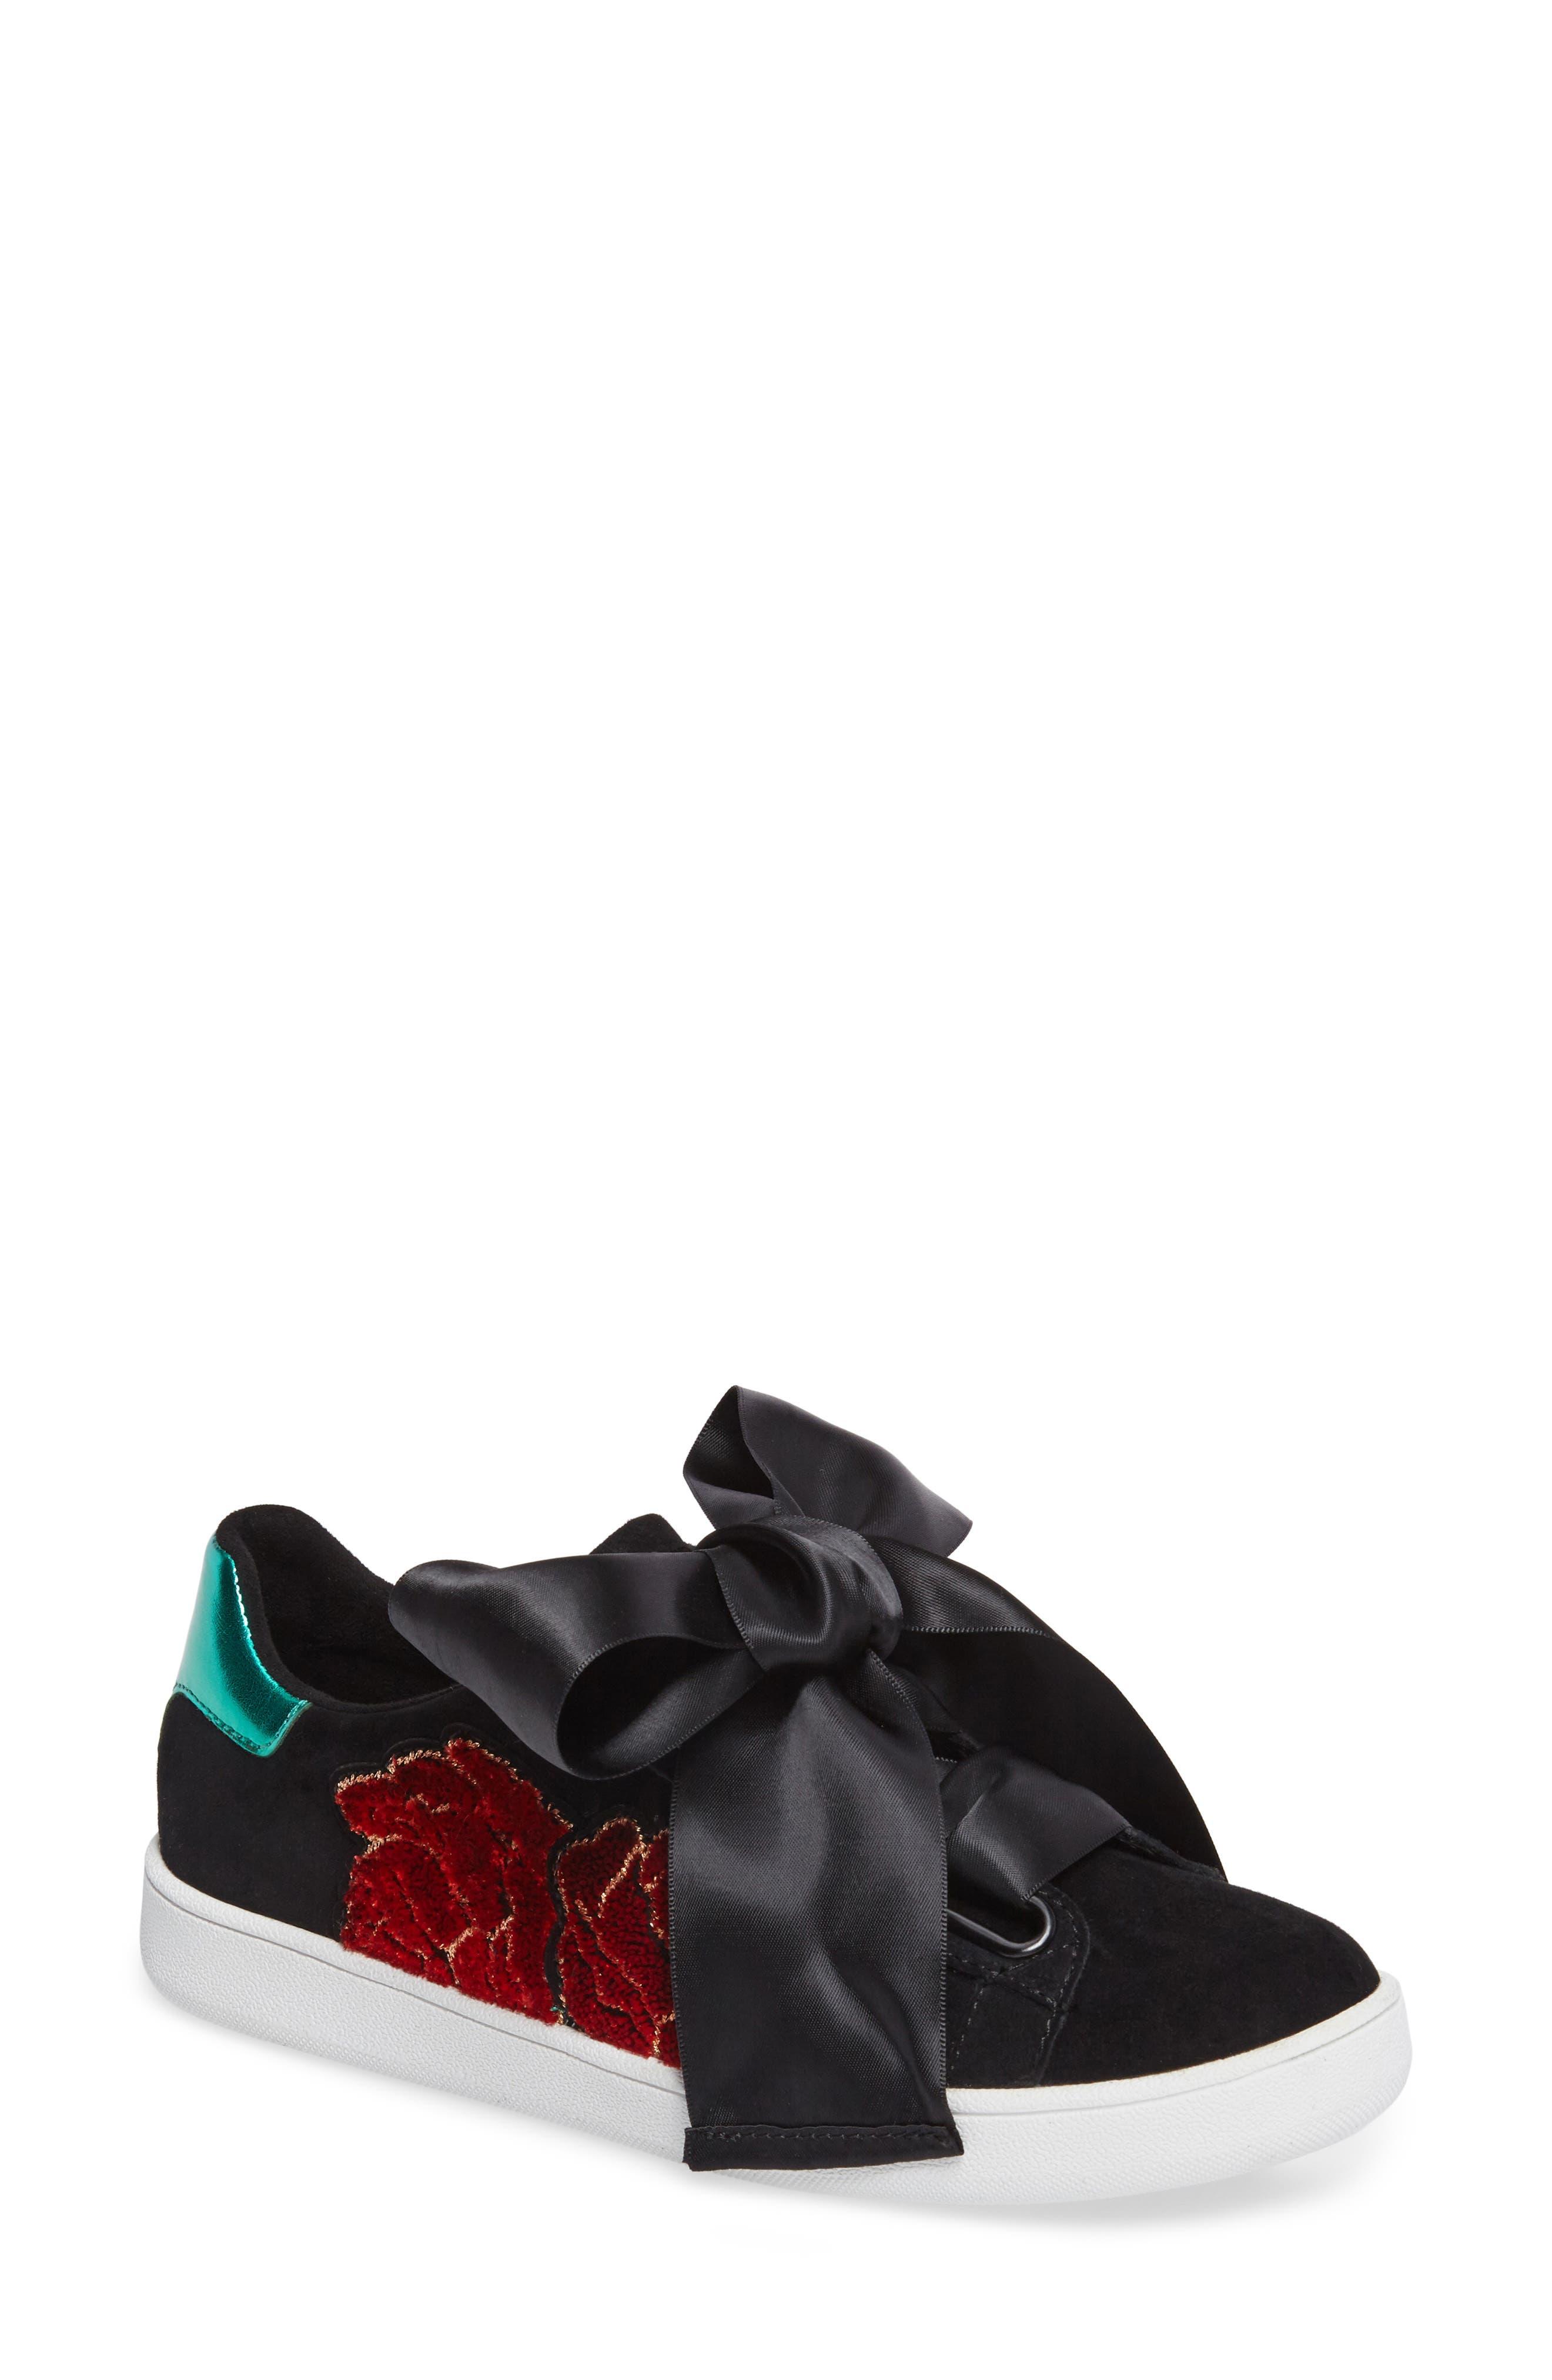 Alternate Image 1 Selected - Jeffrey Campbell Pabst Low-Top Sneaker (Women)